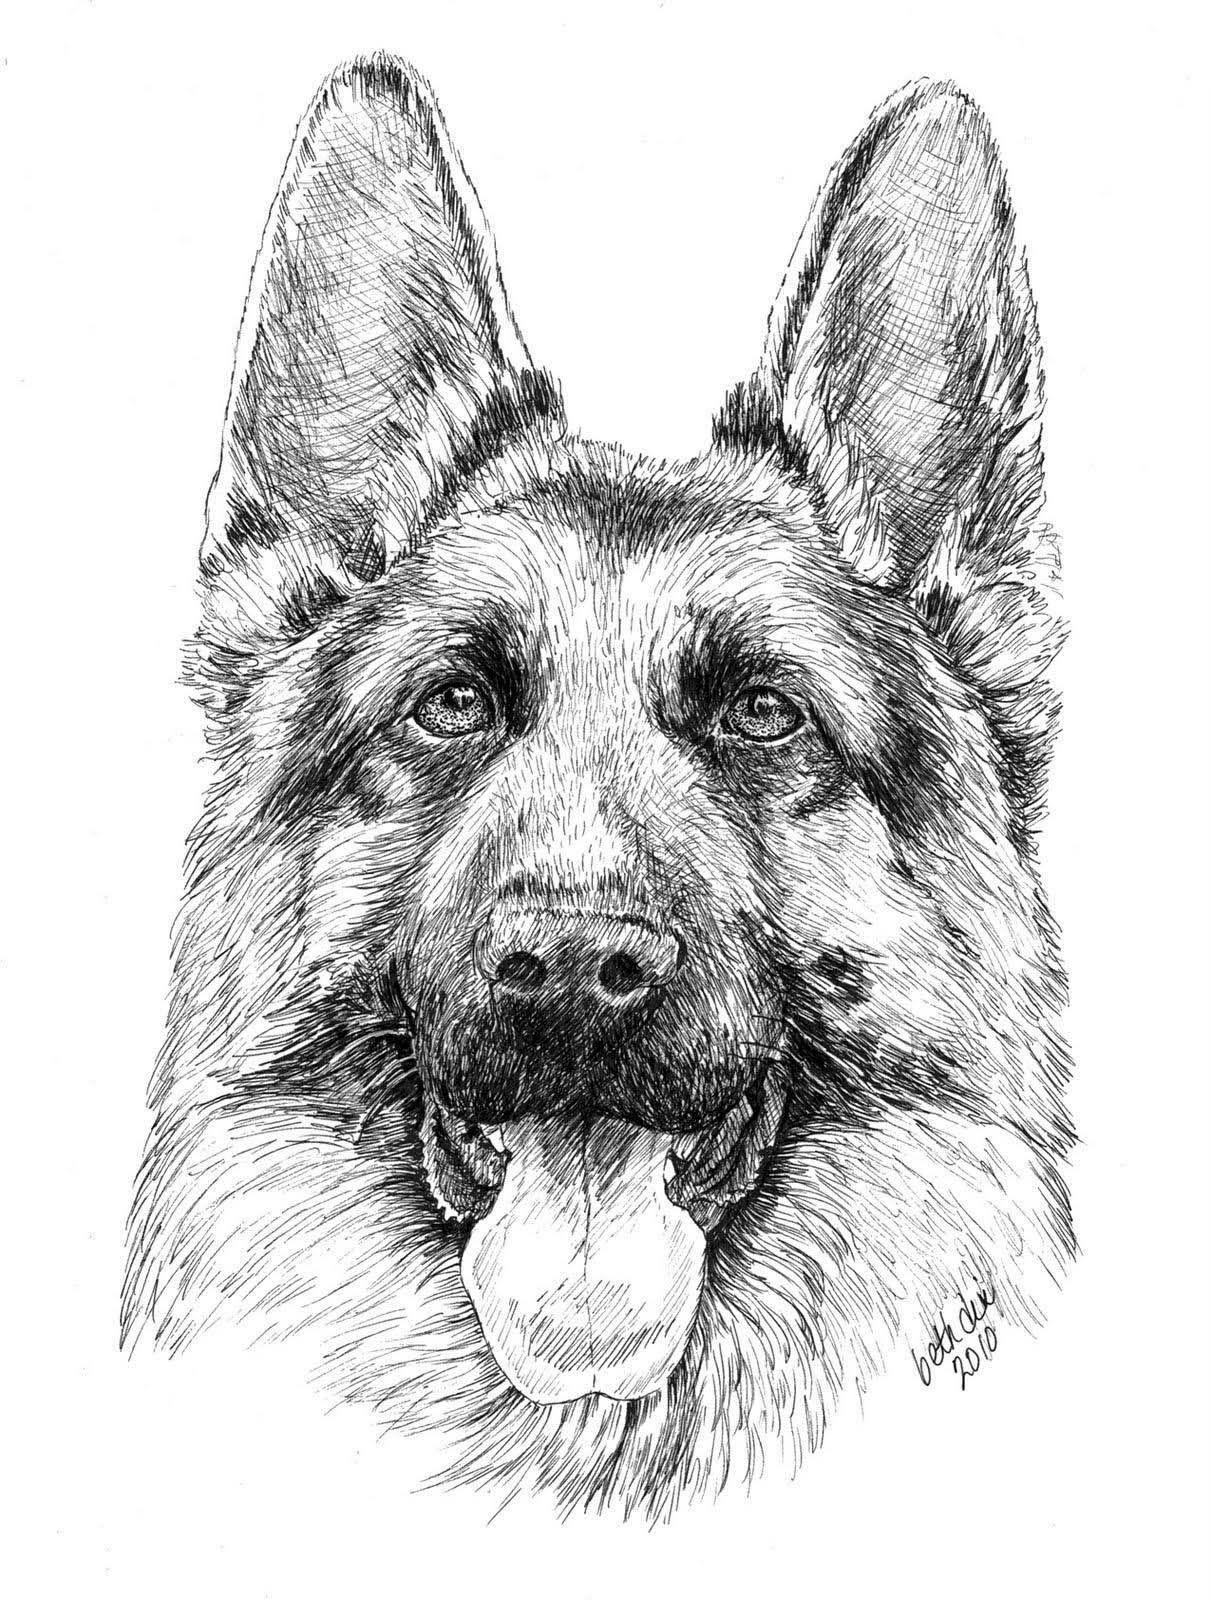 German Shepherd Coloring Pages Best Coloring Pages For Kids In 2020 German Shepherd Art Dog Watercolor Art German Shepherd Colors